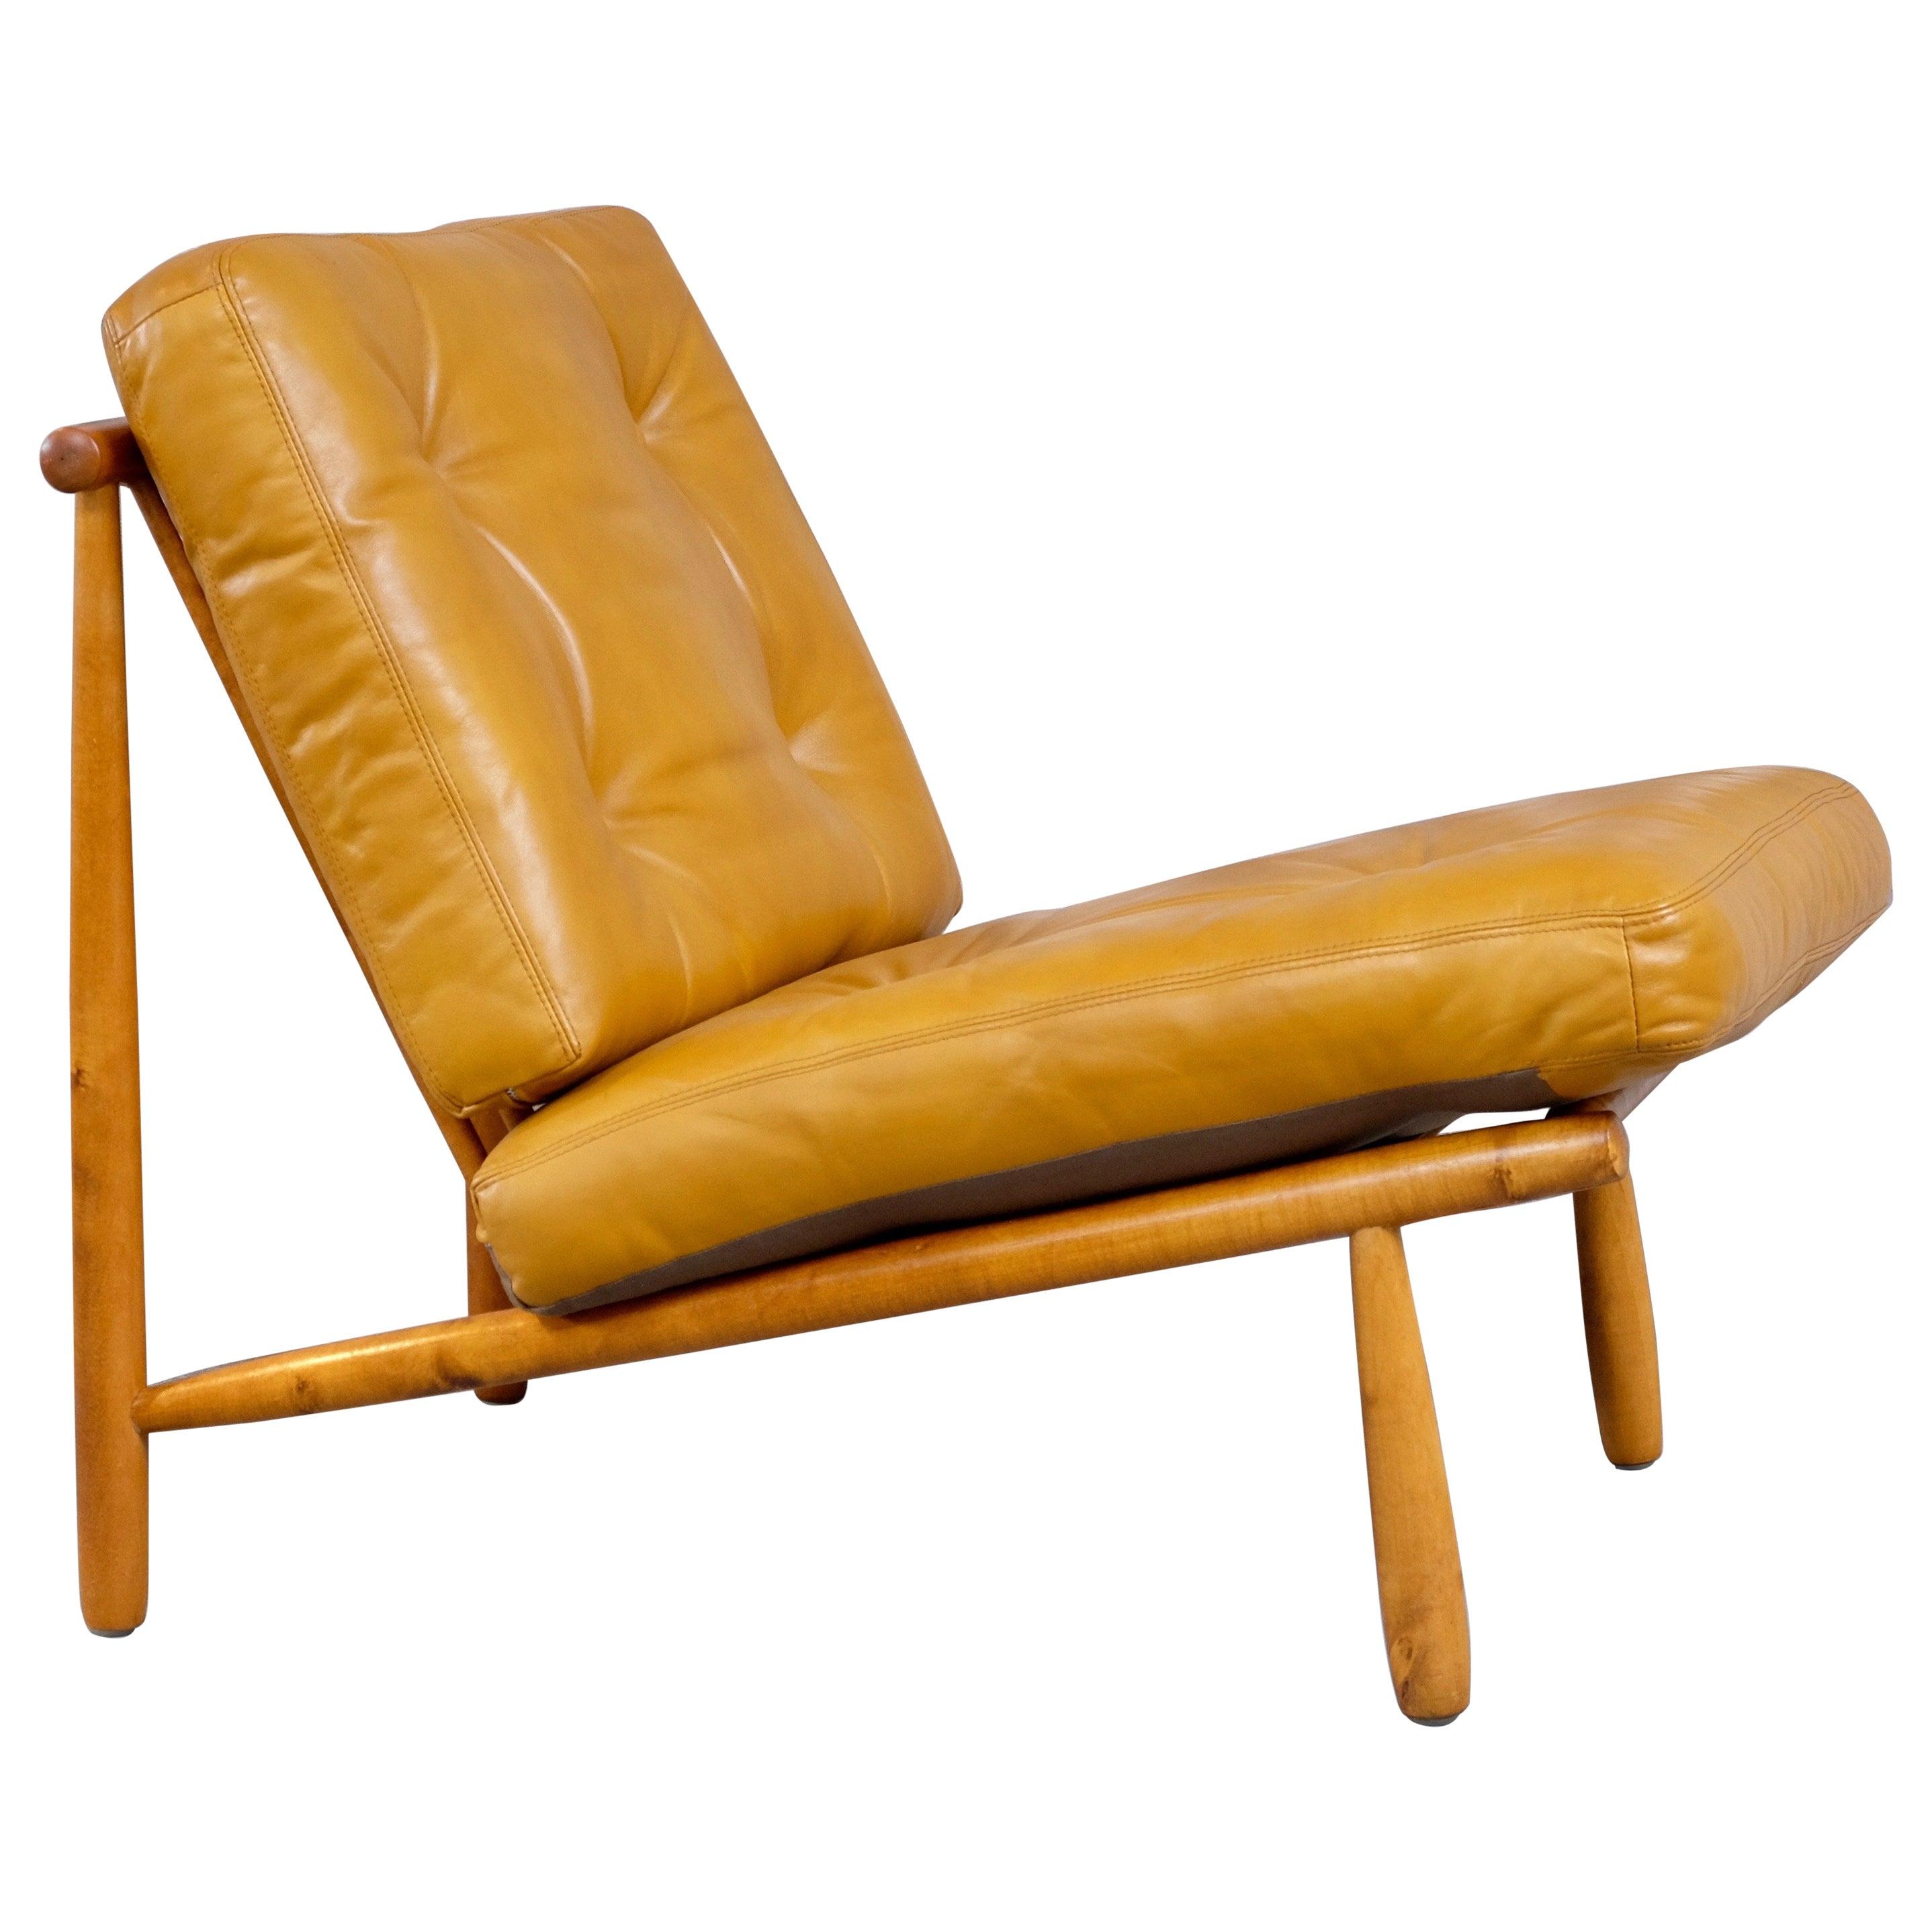 Alf Svensson Easy Chair Model Domus by DUX, 1960s